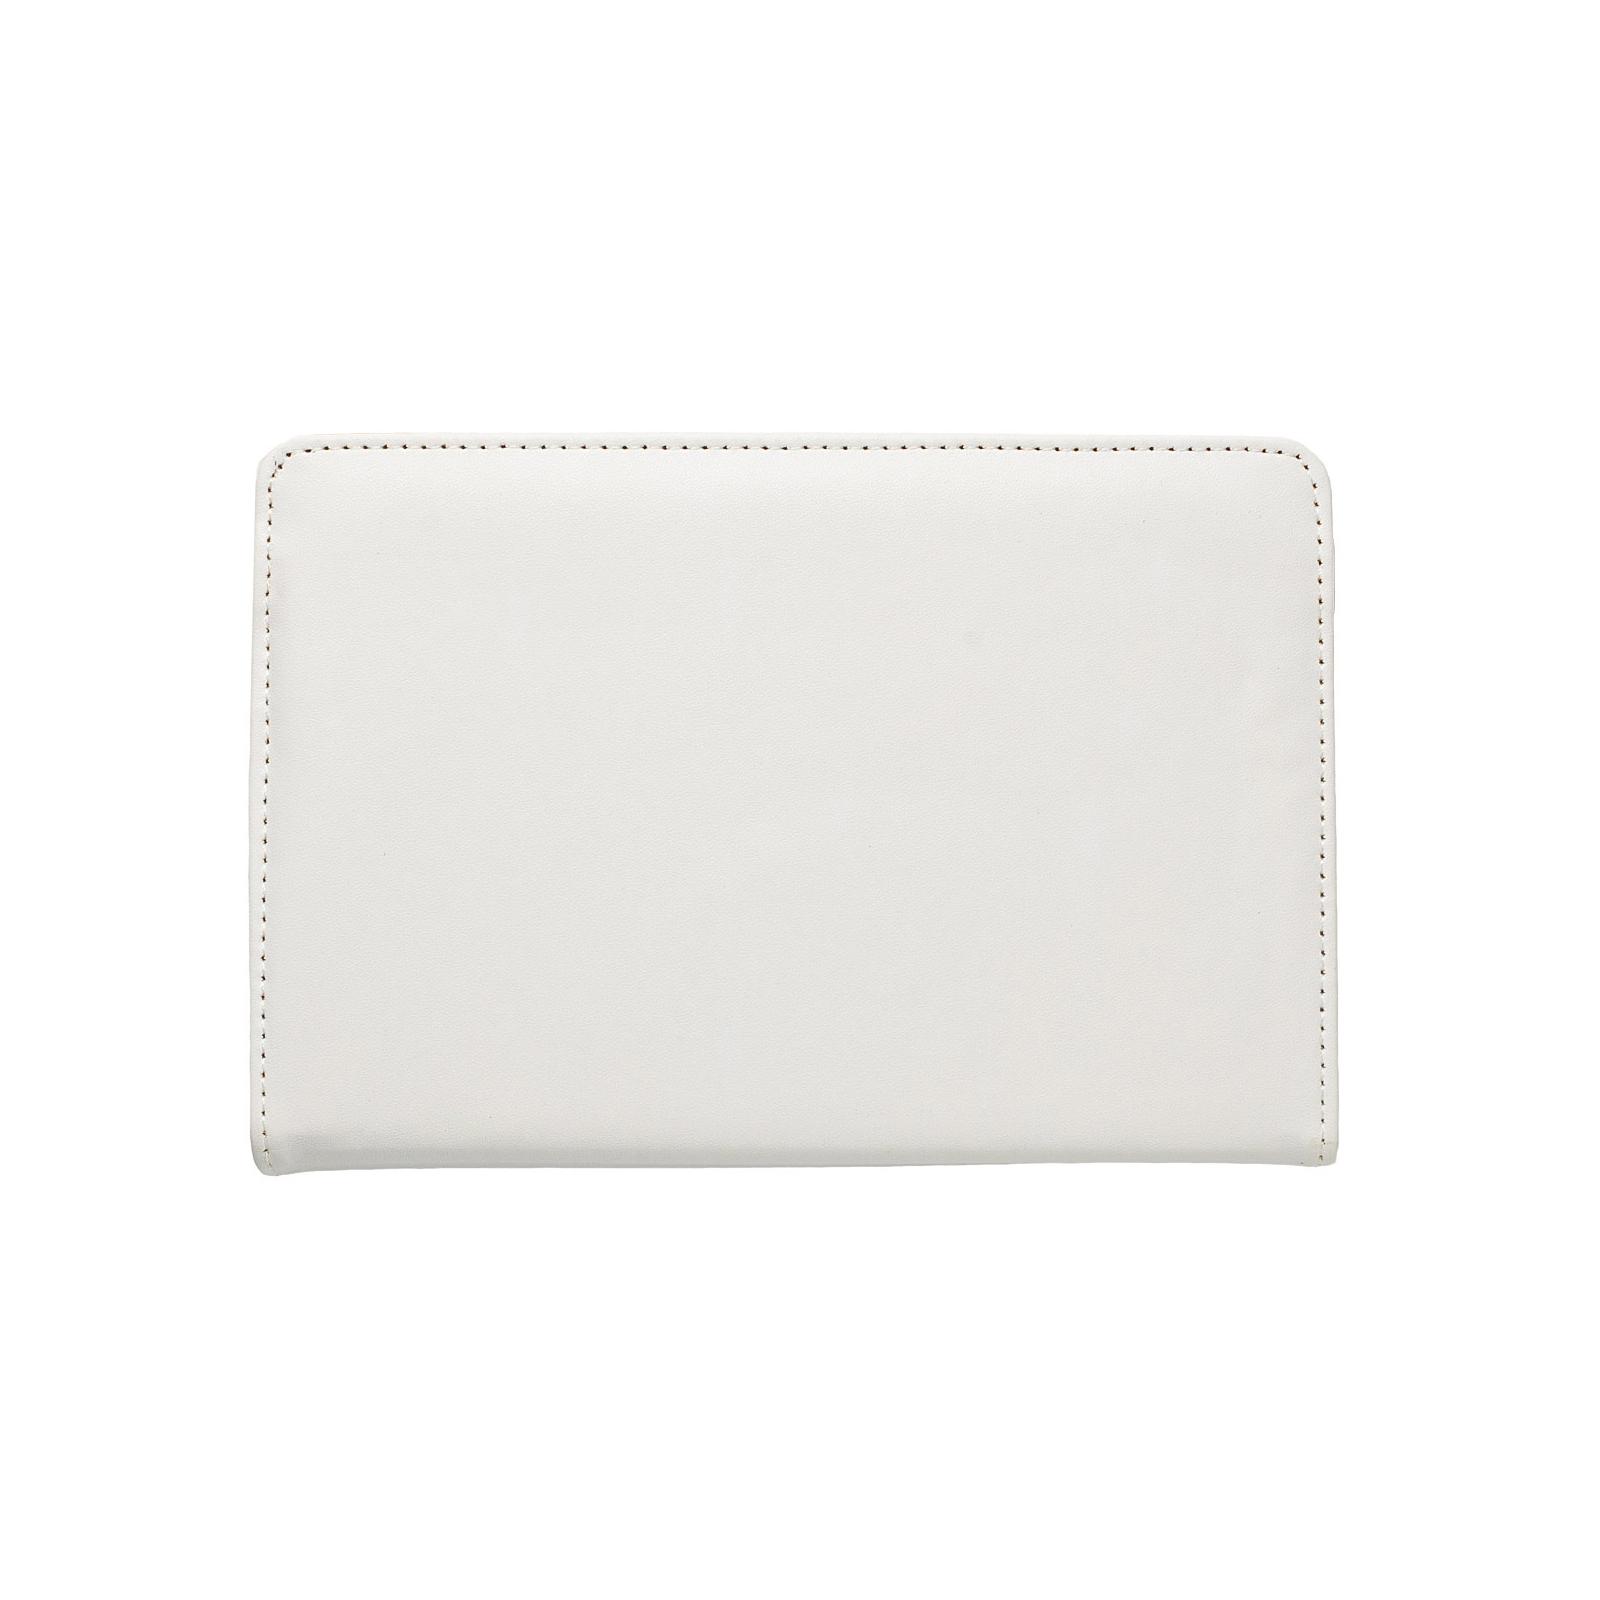 "Чехол для планшета Grand-X universal 7"" Grand-X TC03 White (UTC - GX7TC03W)"